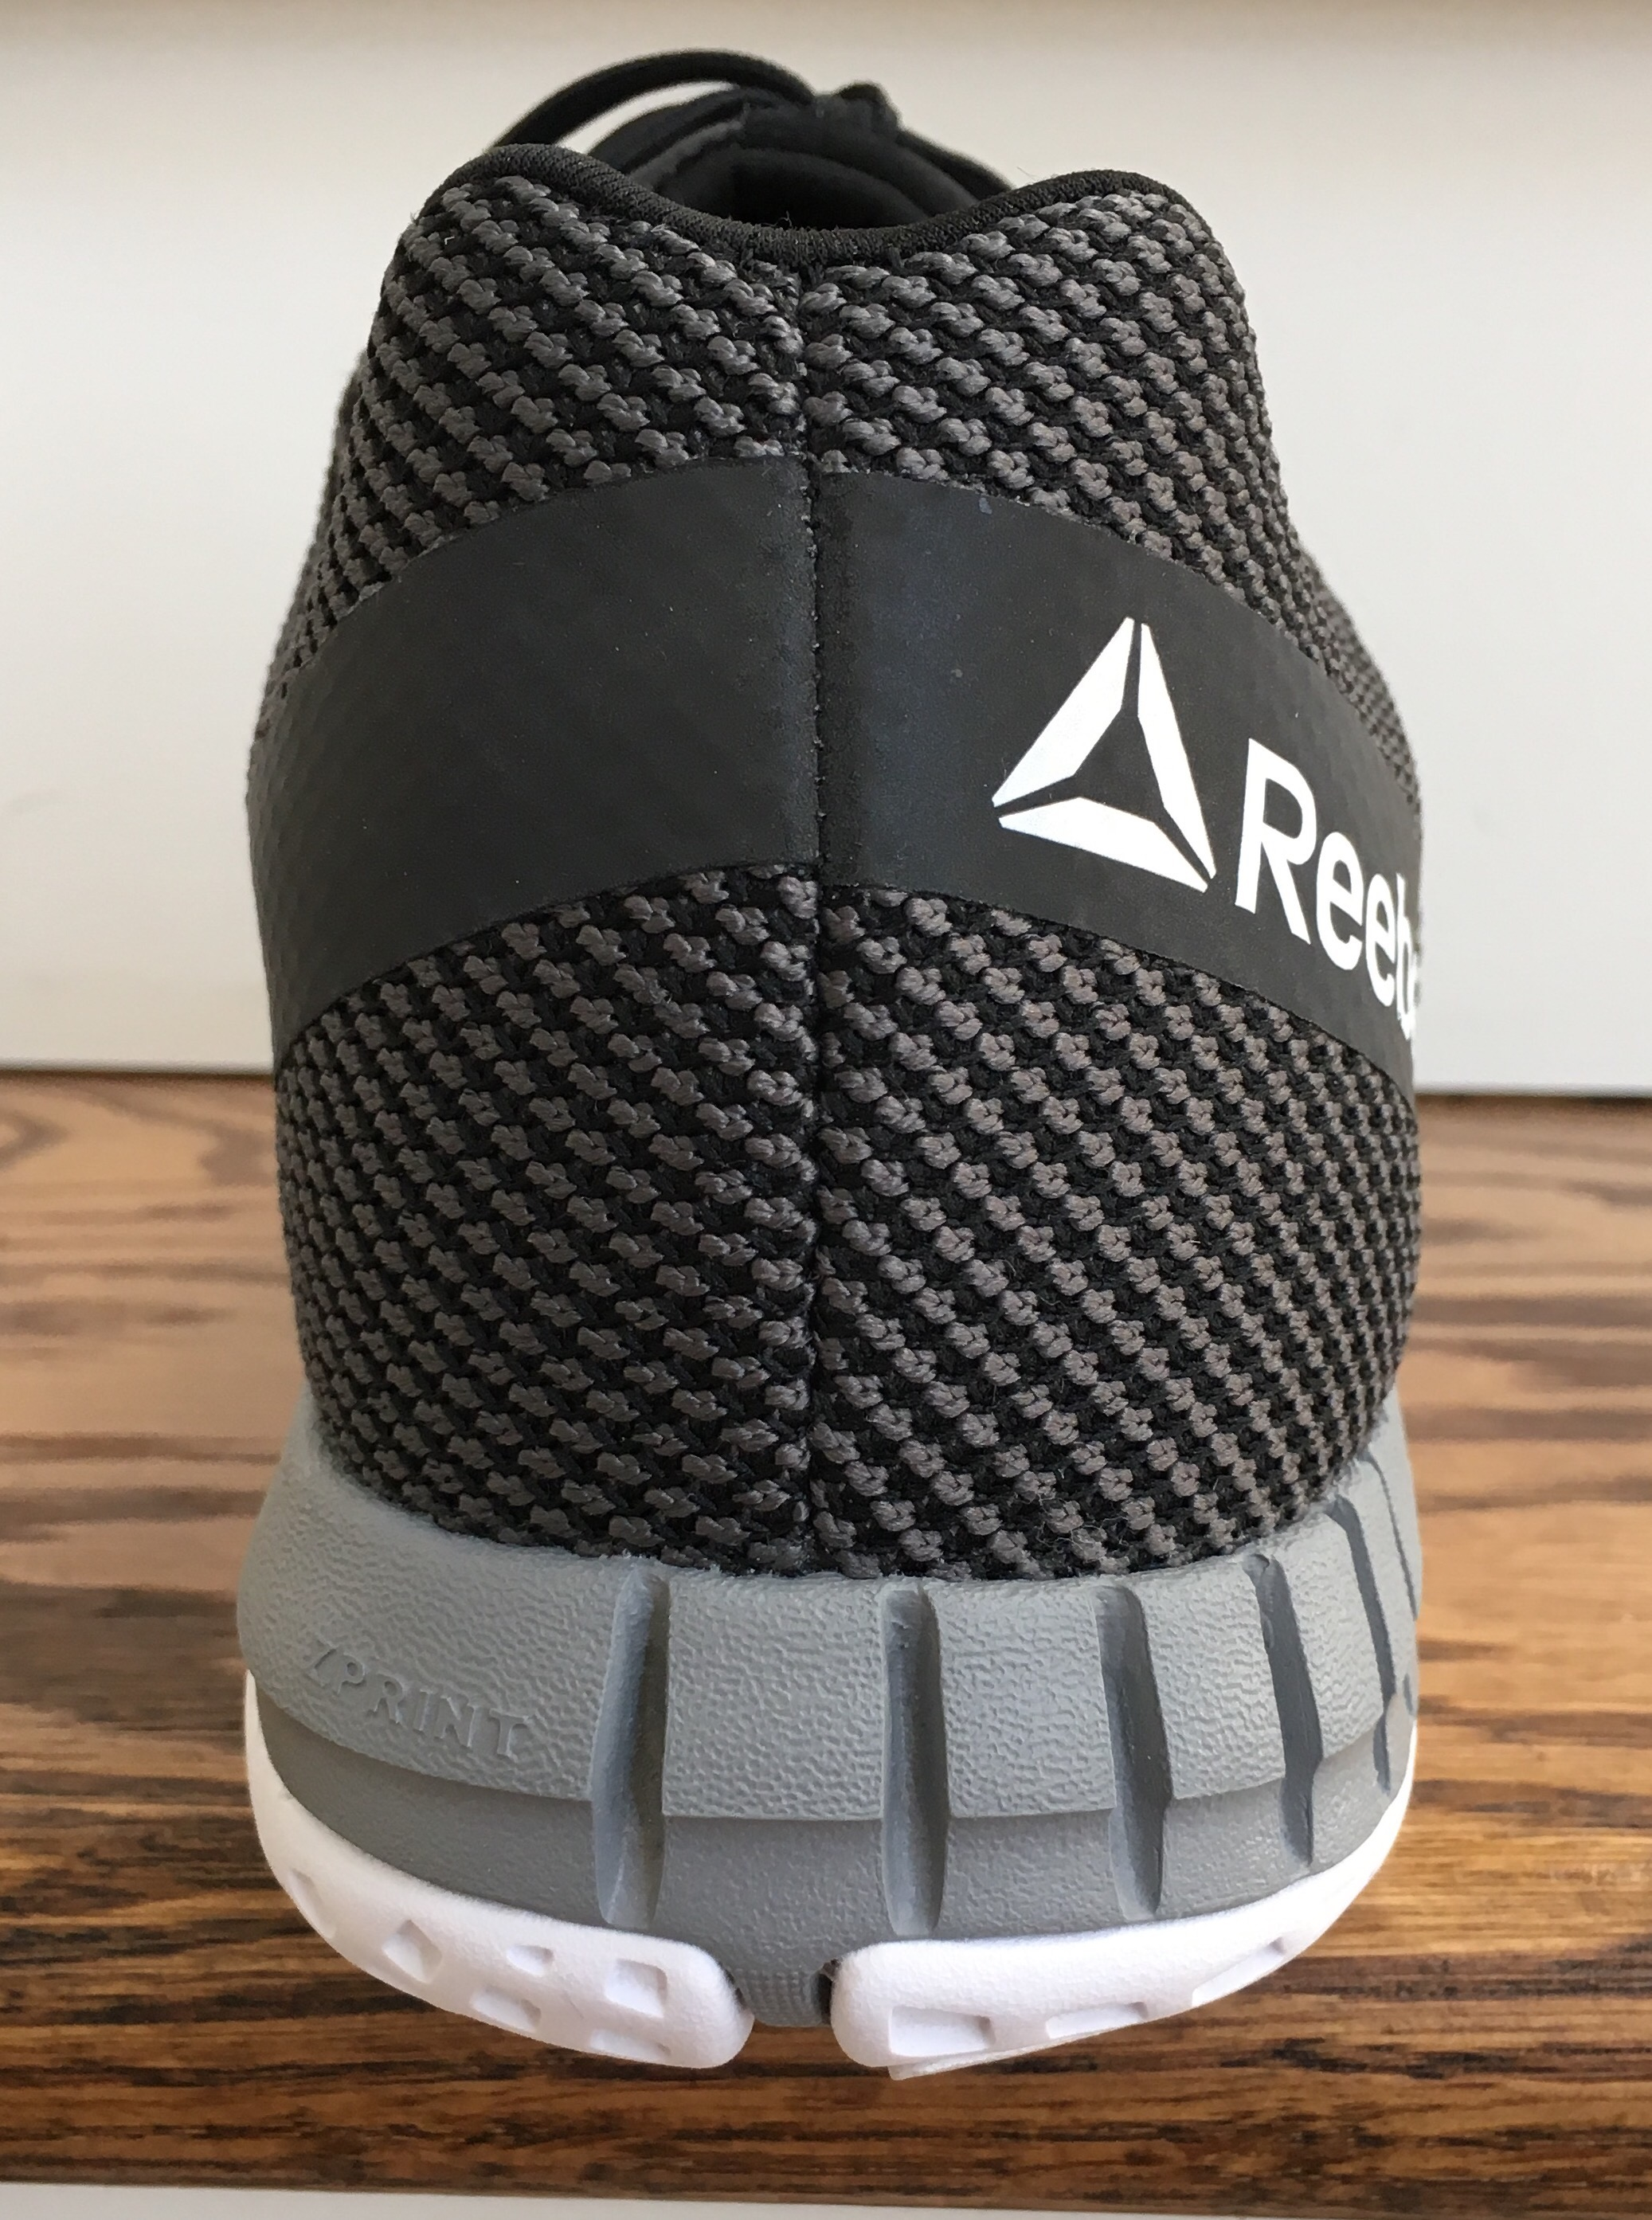 Zapato Z Paseo Reebok Hombres u9350